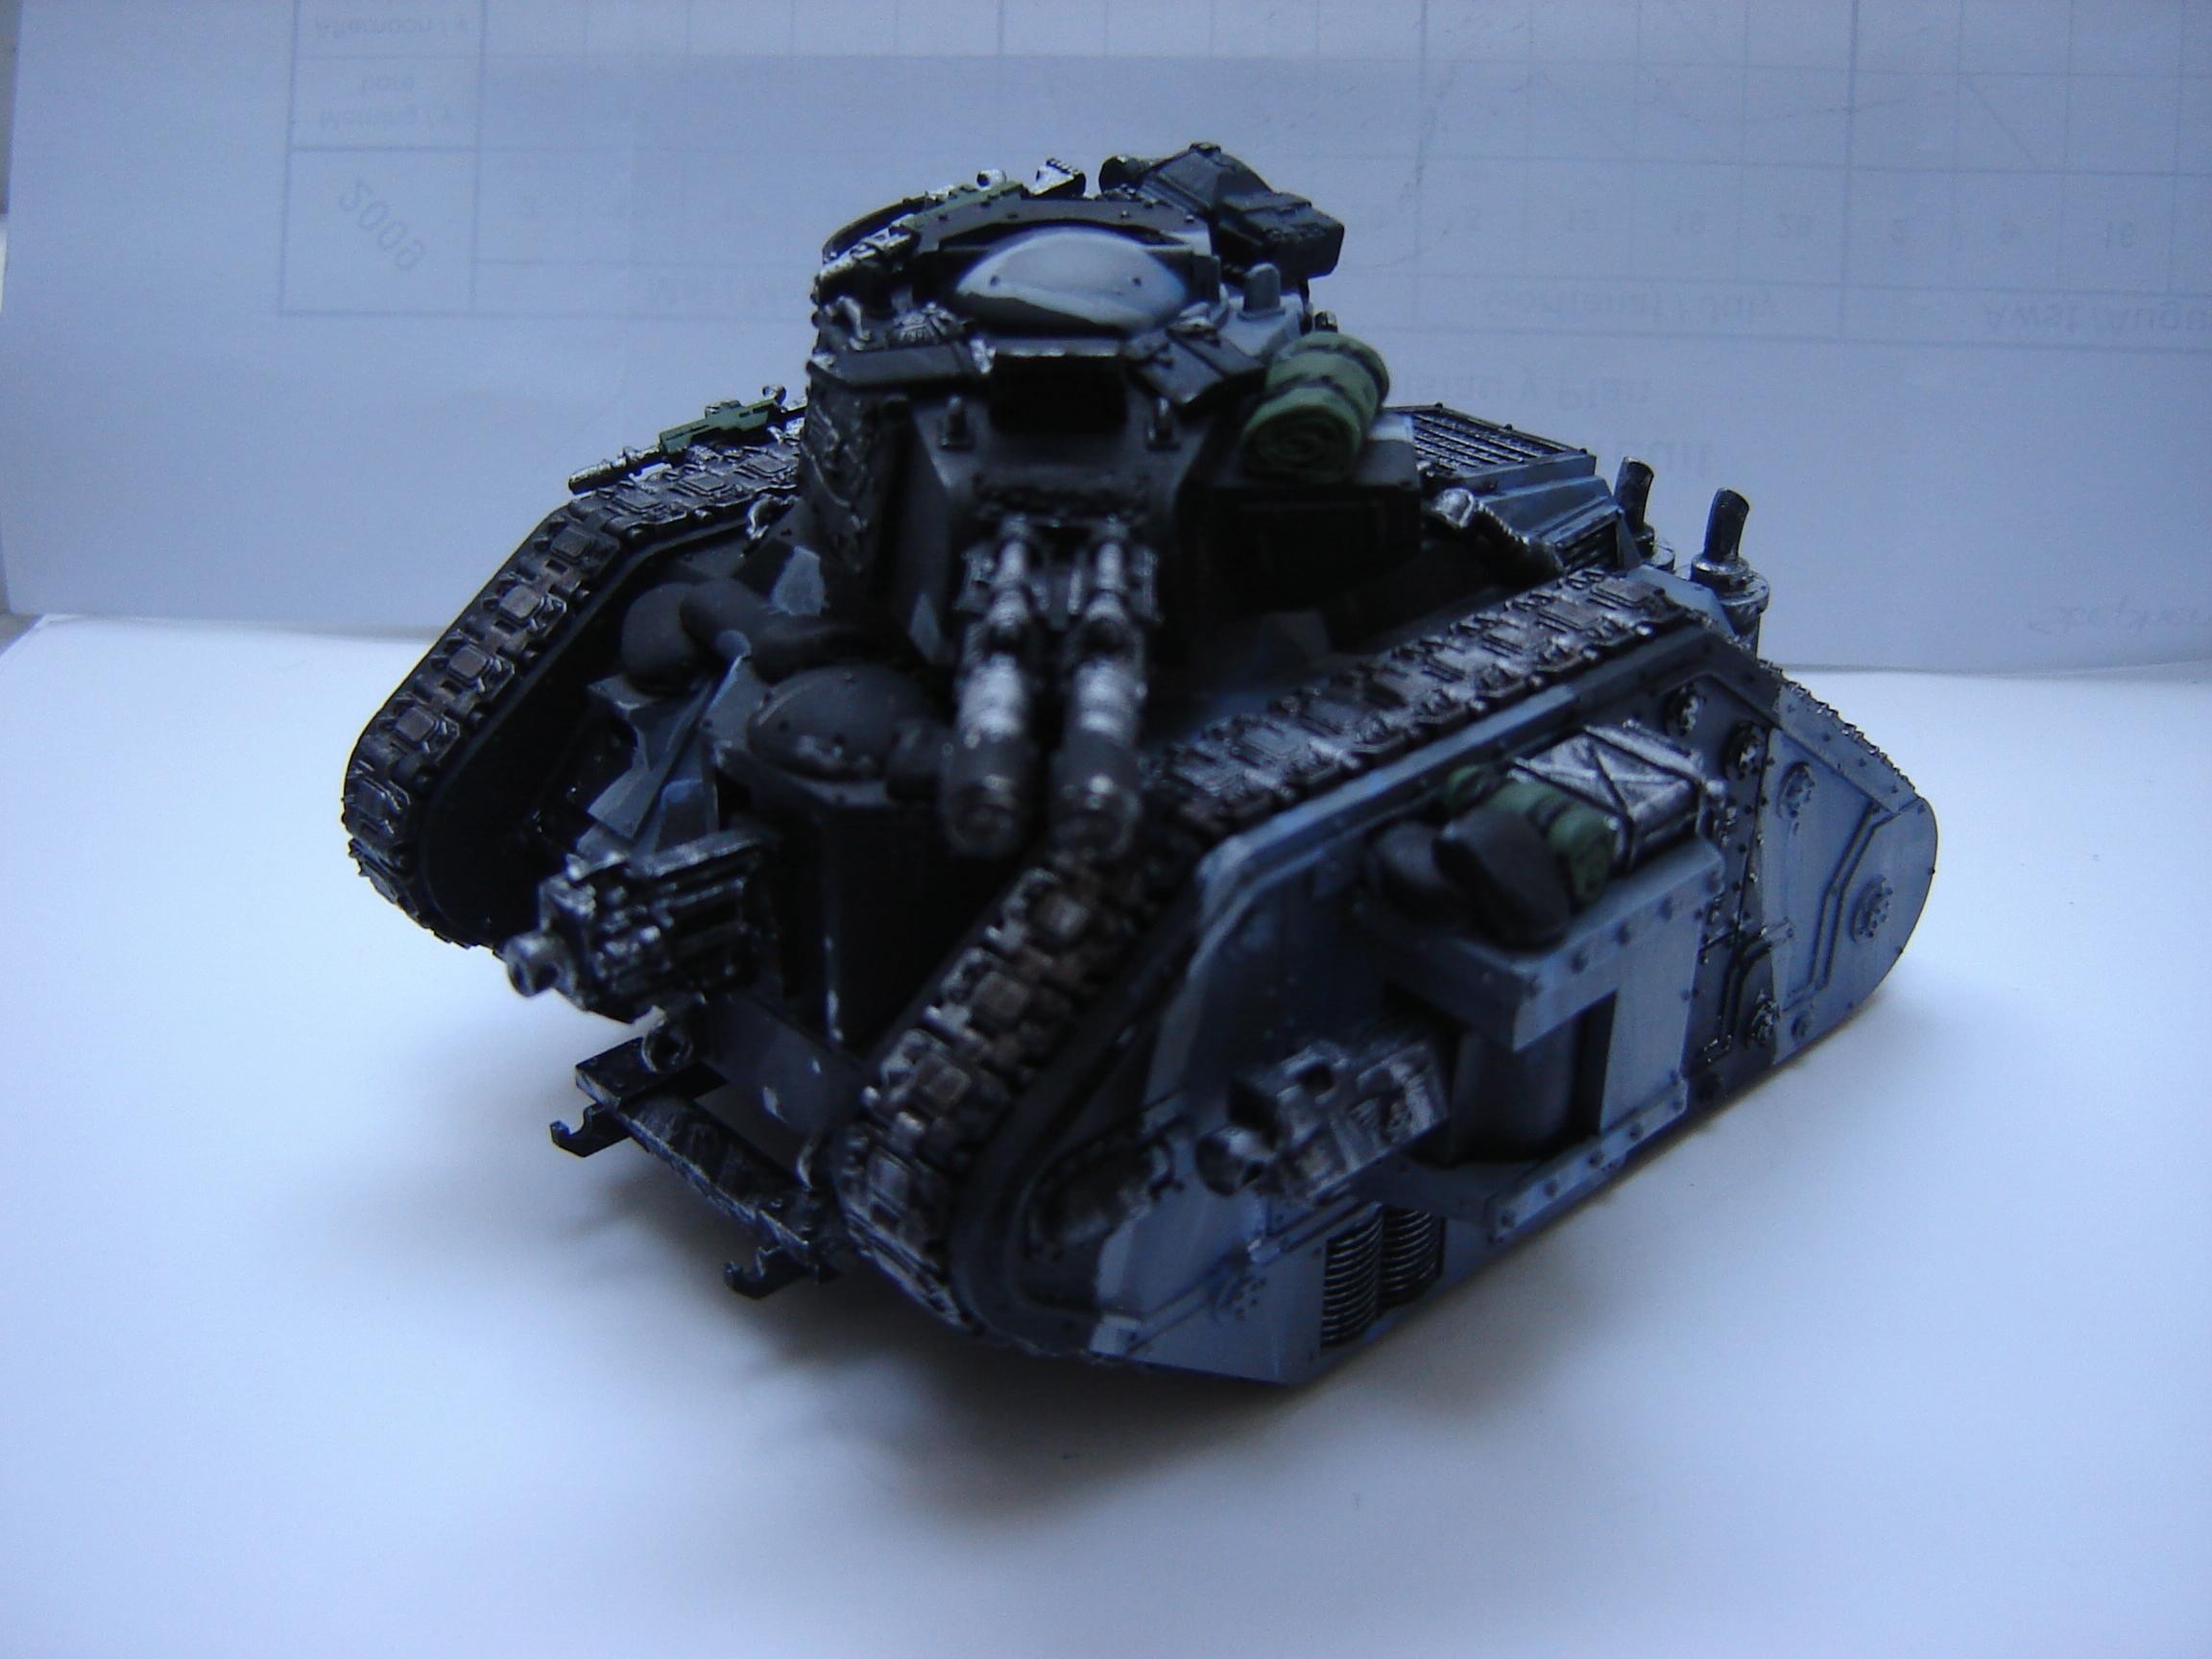 Armored Company, Basilisk, Executioner, Hellhound, Imperial Guard, Leman Russ, Tank, Urban Camo, Warhammer 40,000